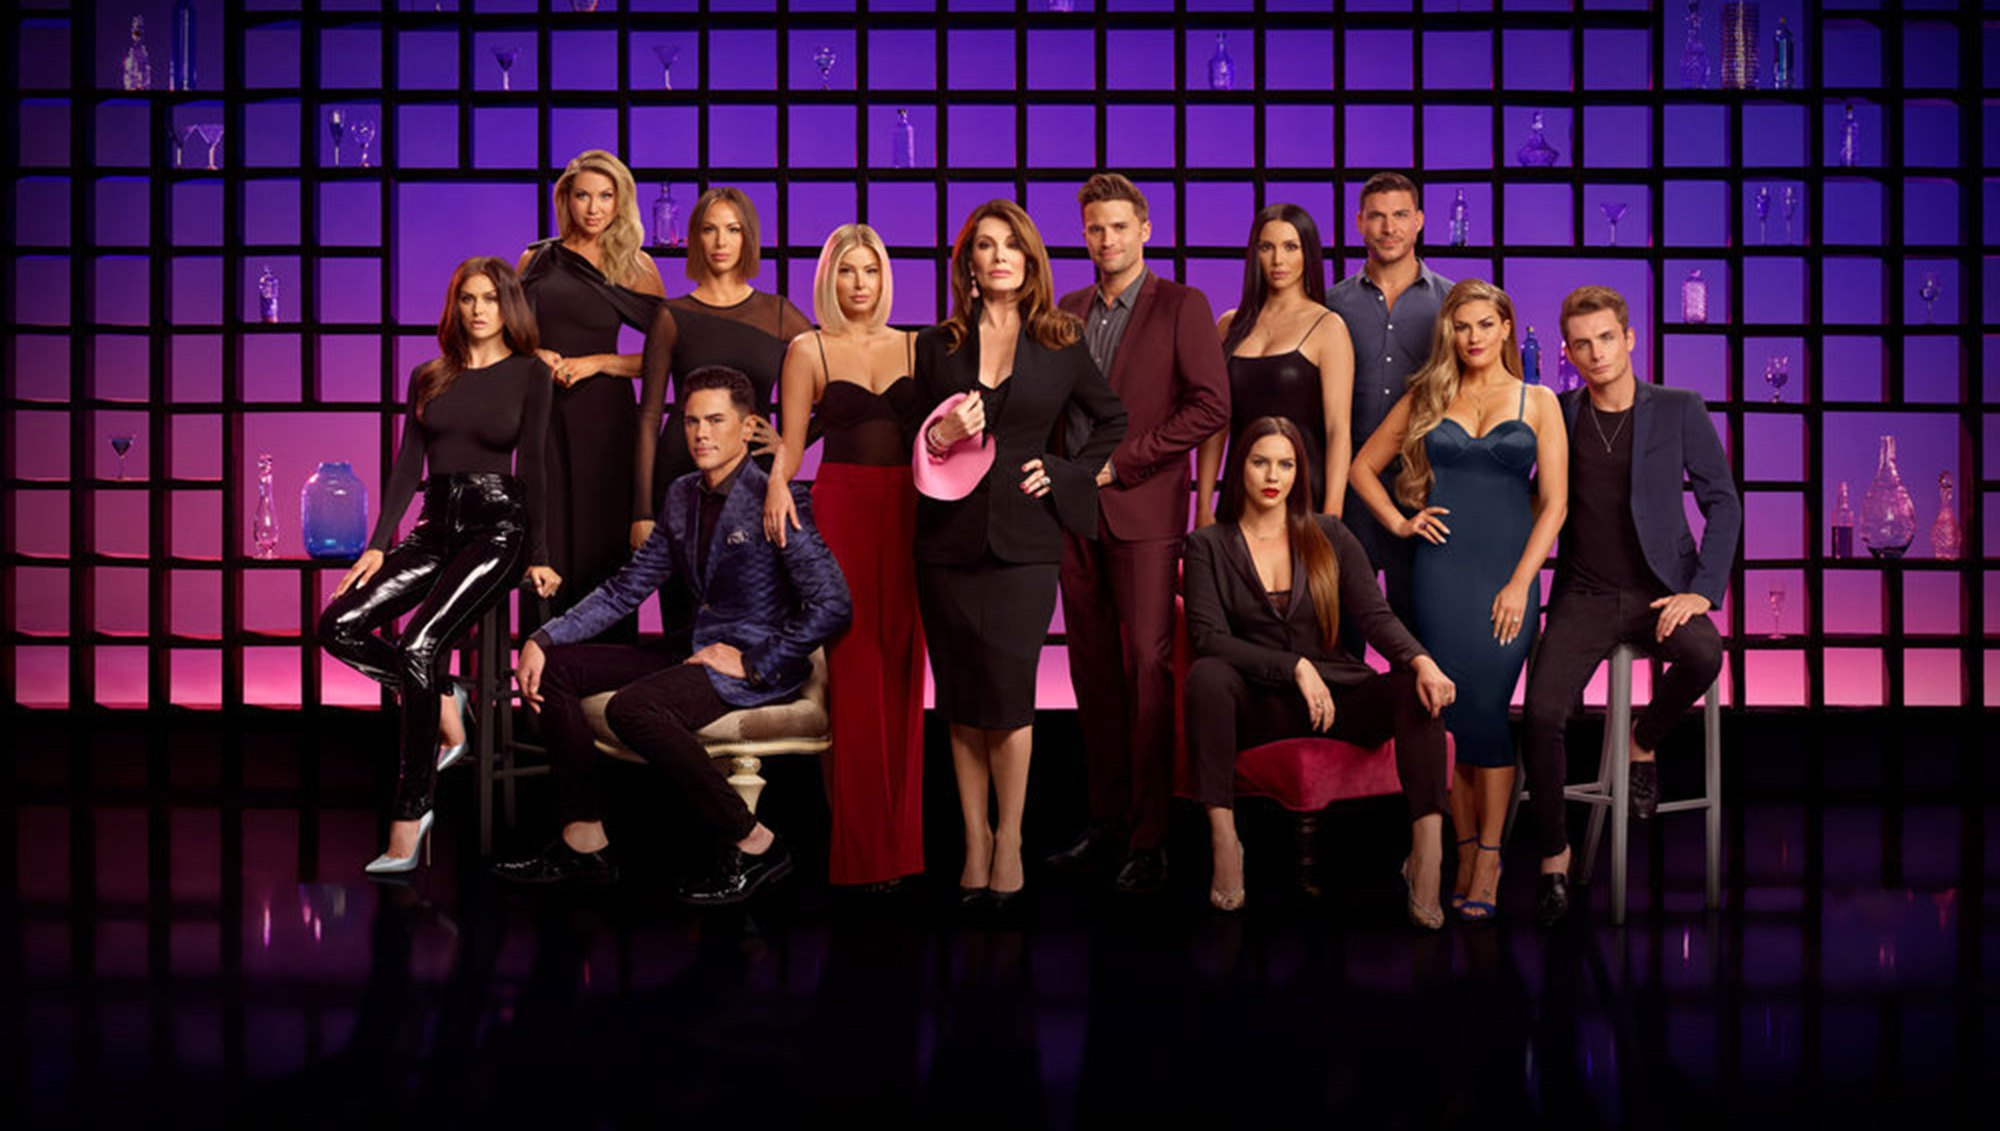 Vanderpump Rules' Season 7 Breakdown: How Do the First Three Episodes Rank?